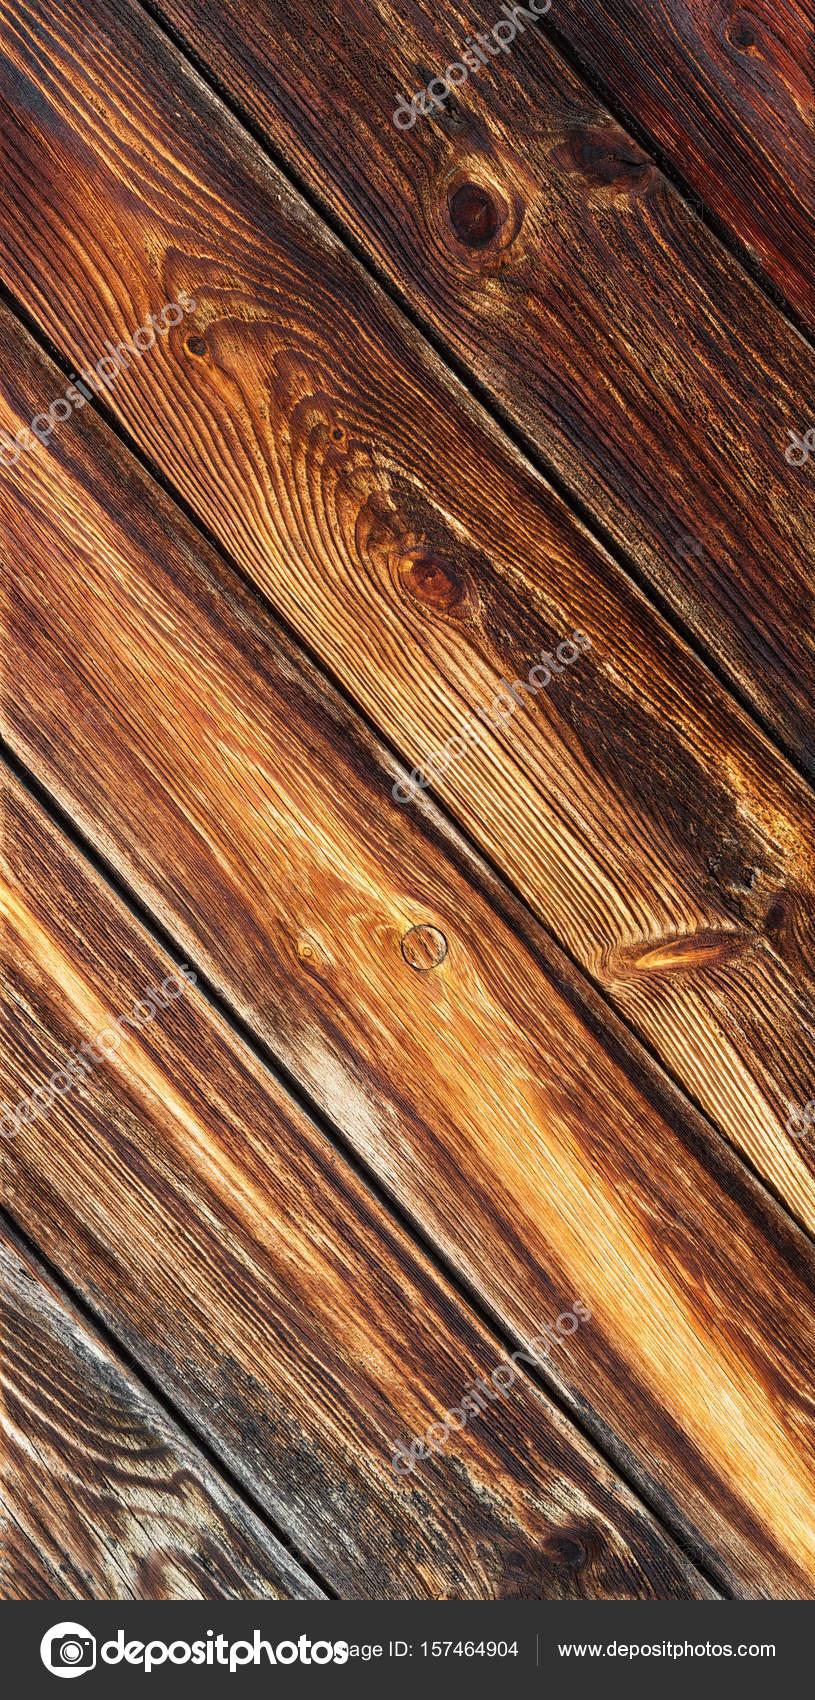 alte holzbohlen textur — stockfoto © auriso #157464904